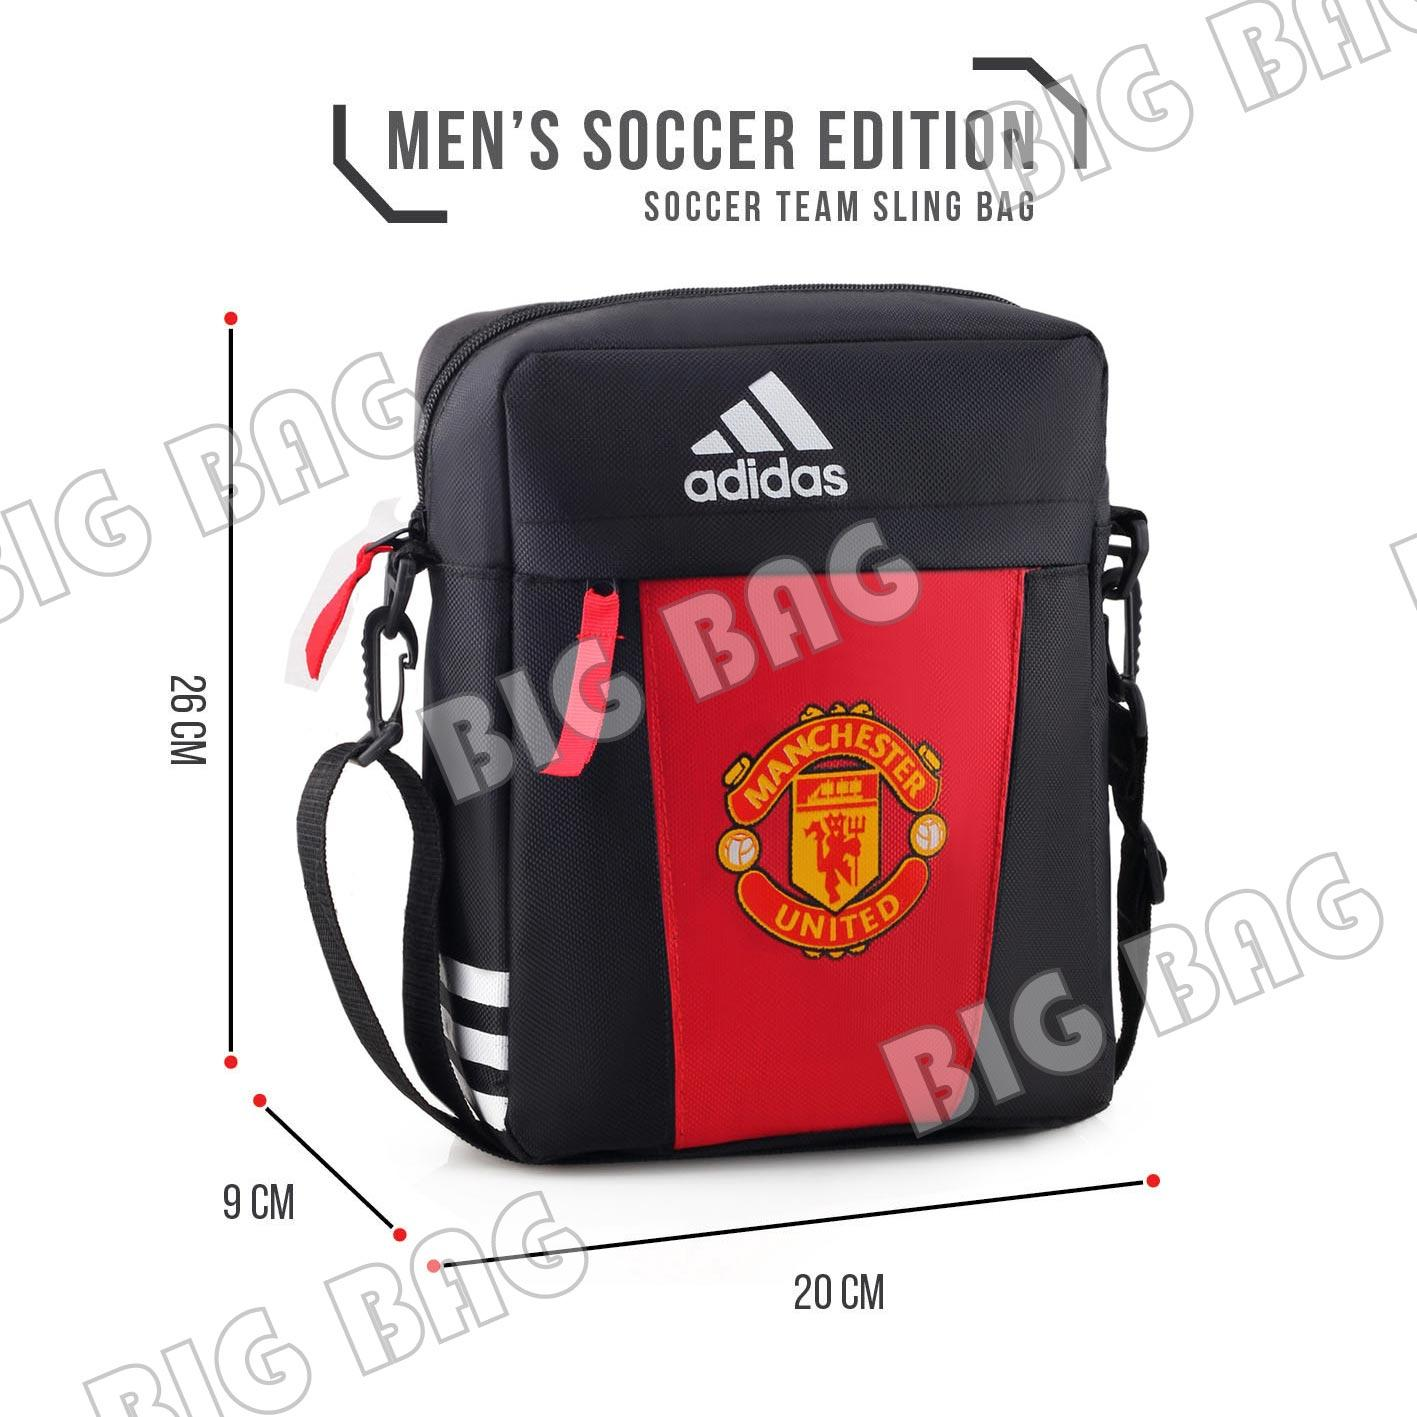 Tas Ransel Bola Sports Pria Adidas Bola Pria M U Chevrolet Laptop Backpack Red